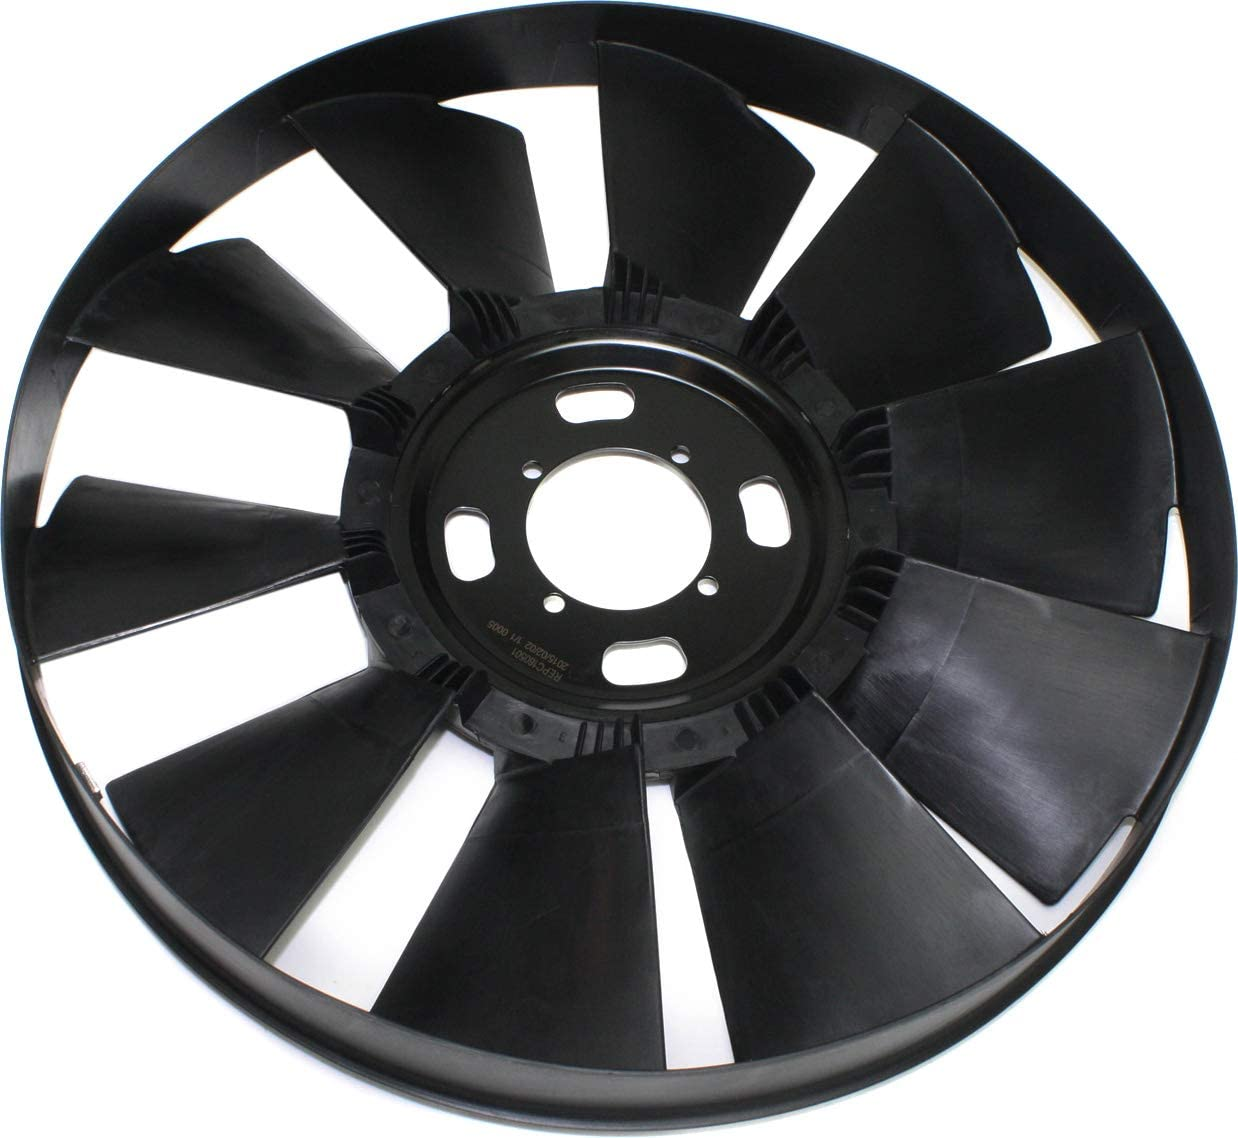 Radiator Fan Blade Compatible with GMC Envoy/Trailblazer/Rainier 2002-2009